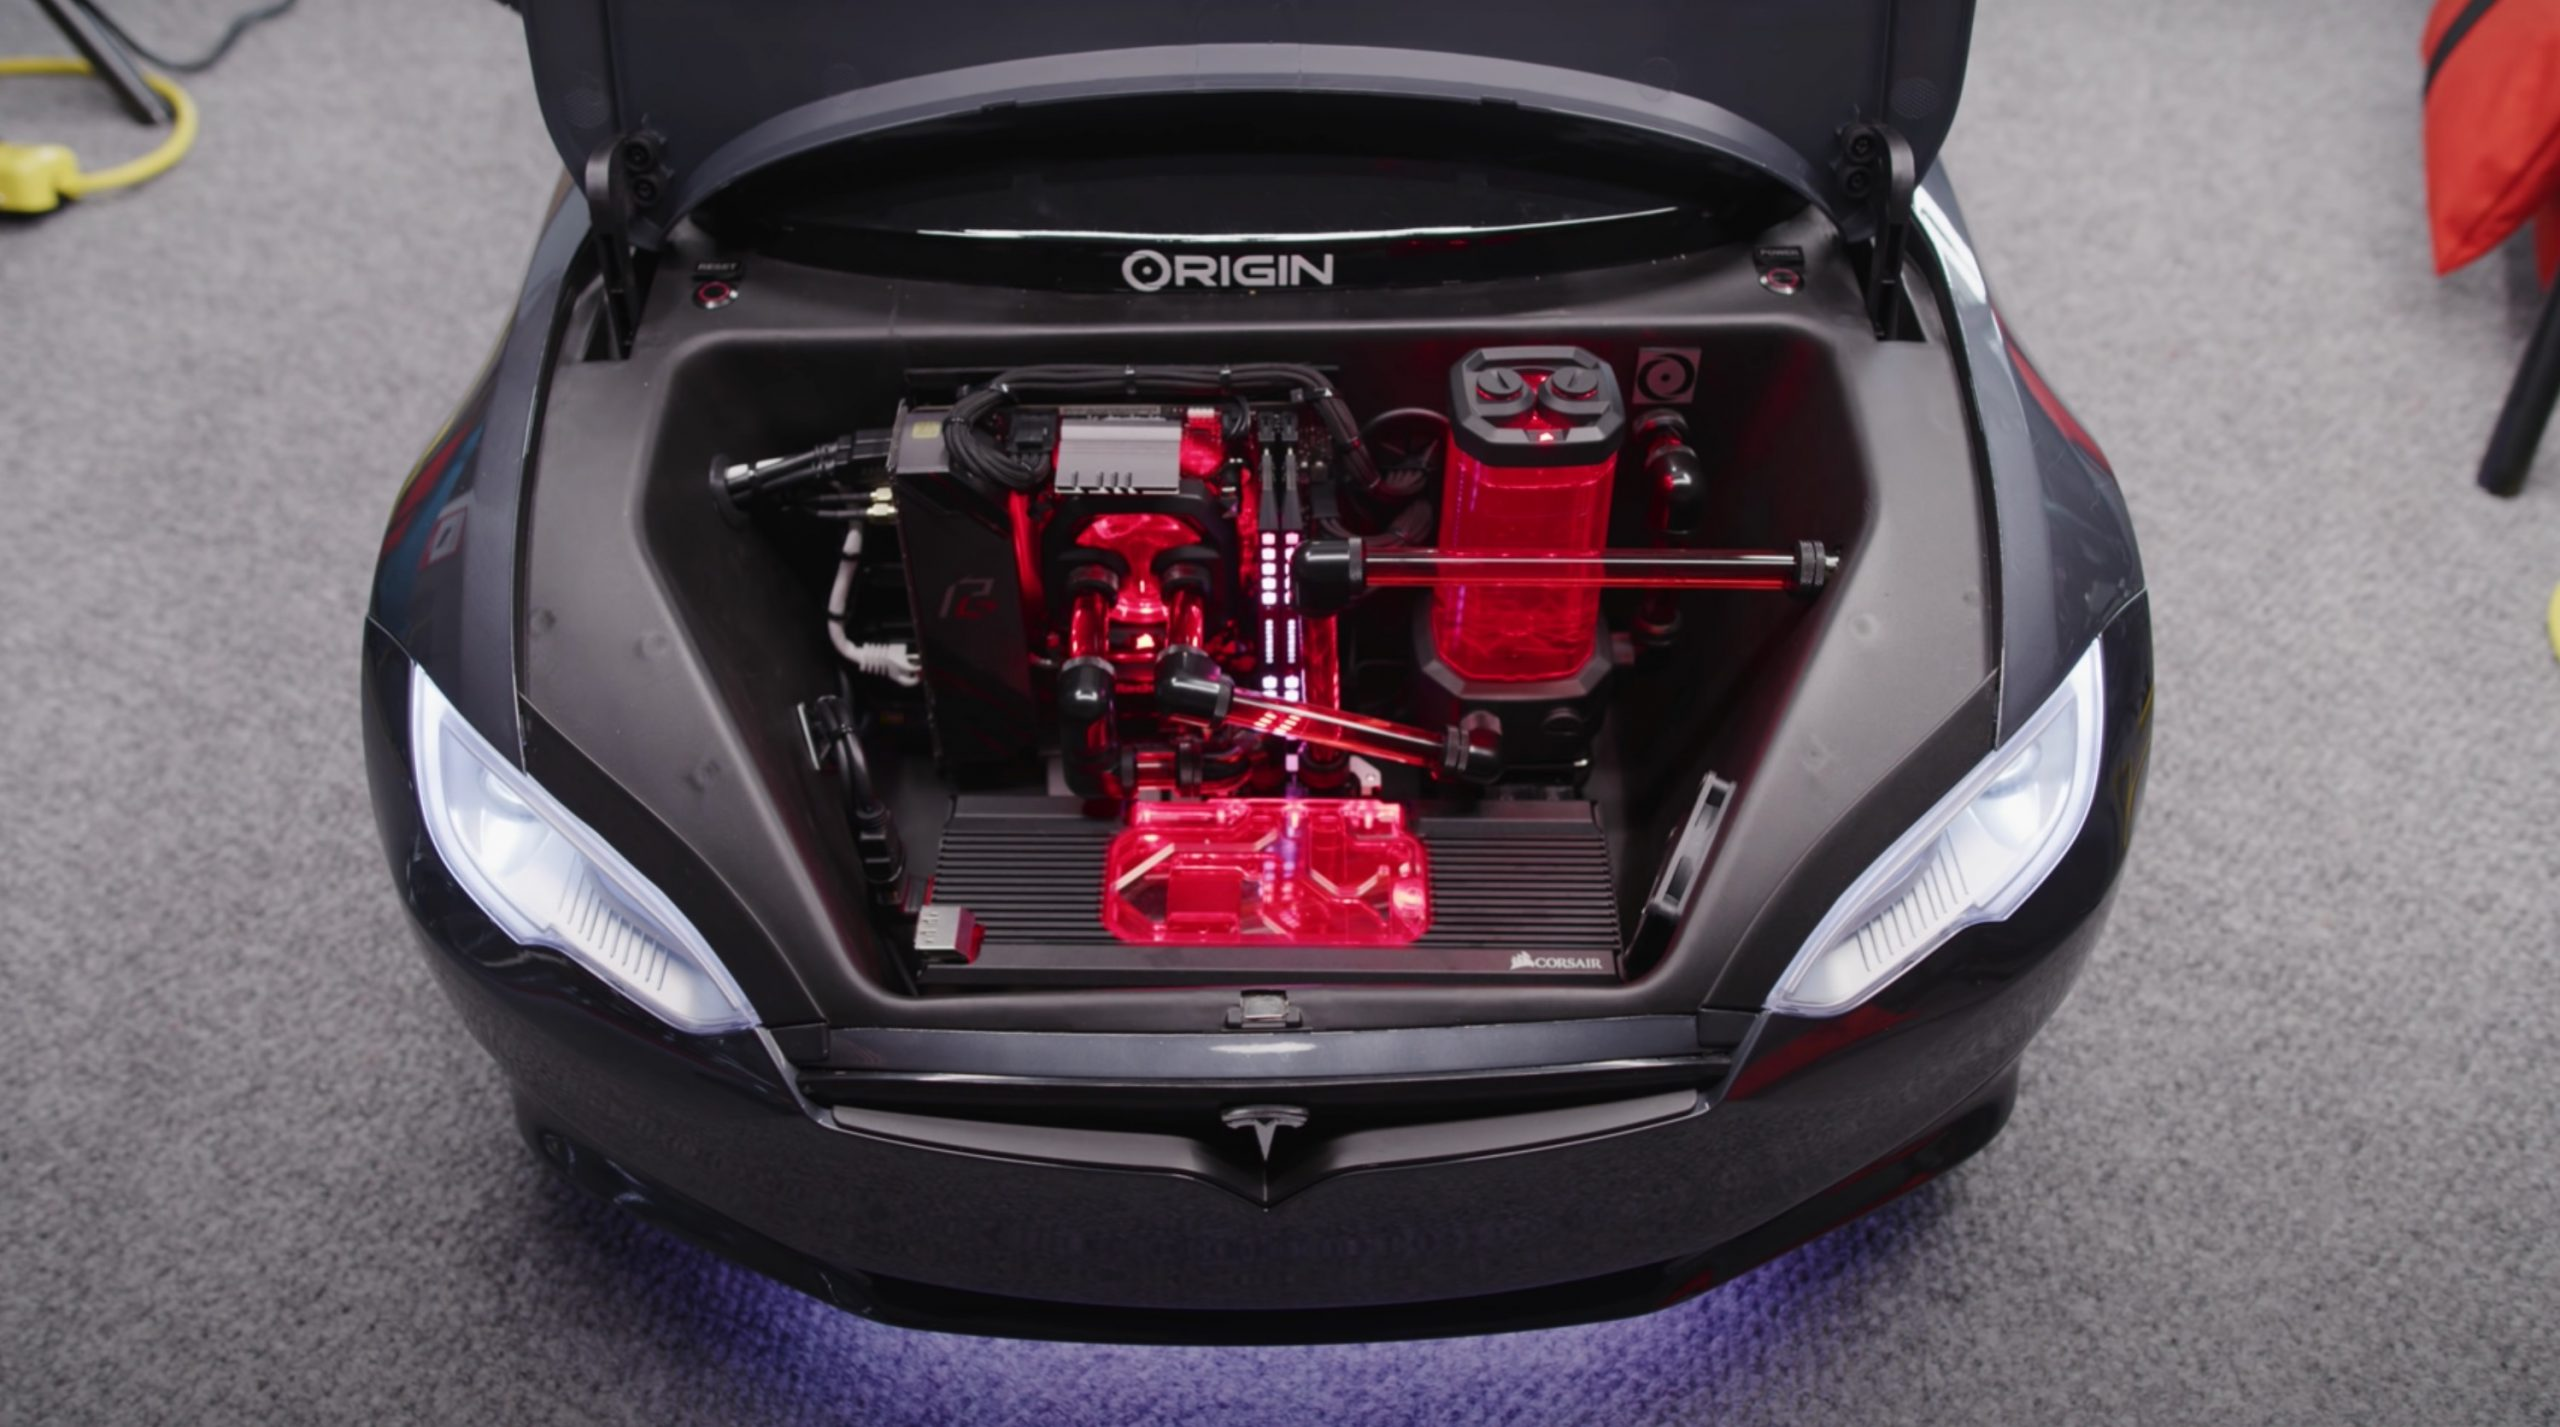 Tesla Model S for Kids Origin PC gaming system